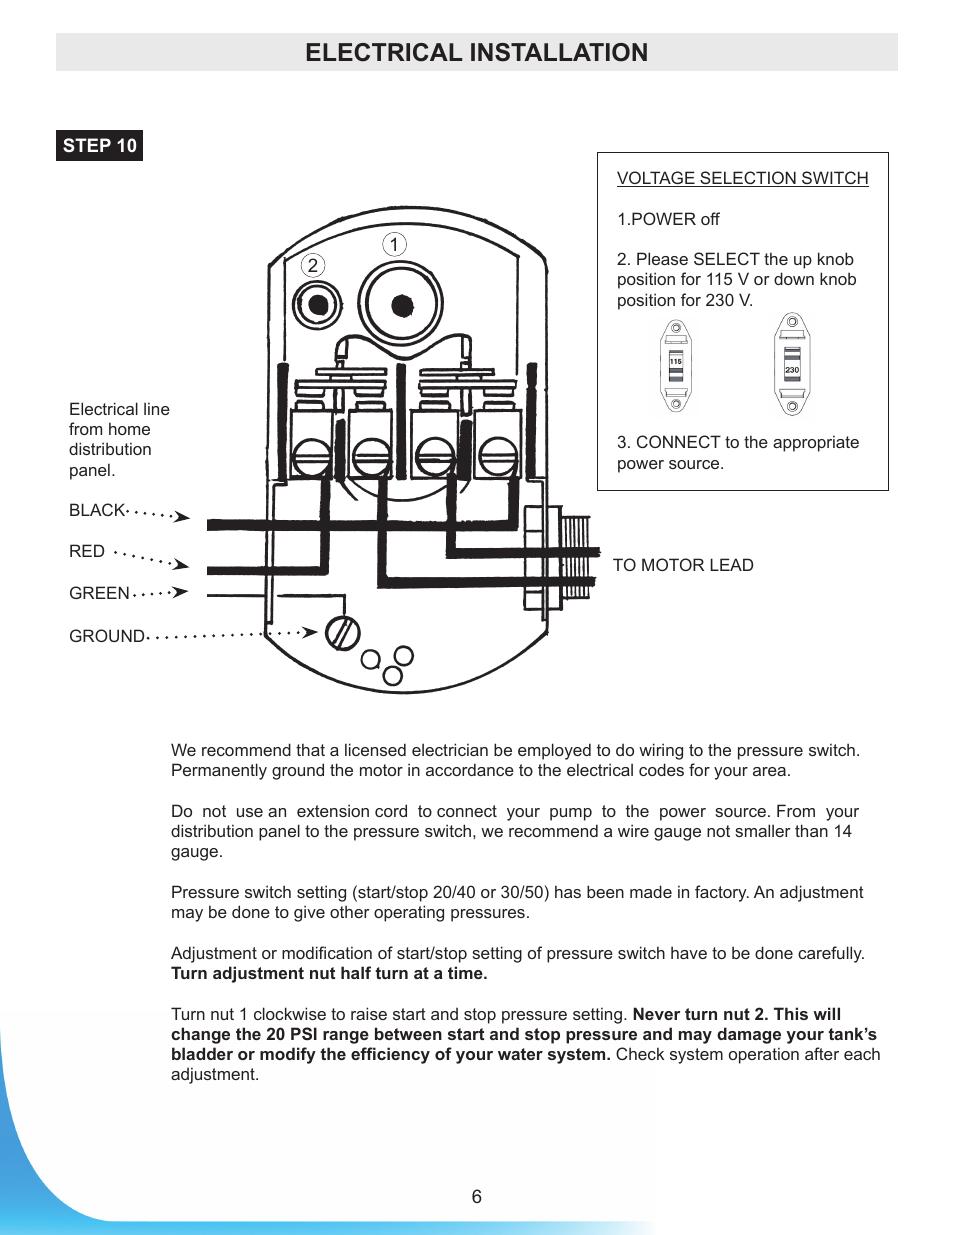 Jet Pump Wiring Just Another Diagram Blog Motor Www Manualsdir Com Manuals 361737 6 Burcam 506518s Rh Broccli Co Goulds